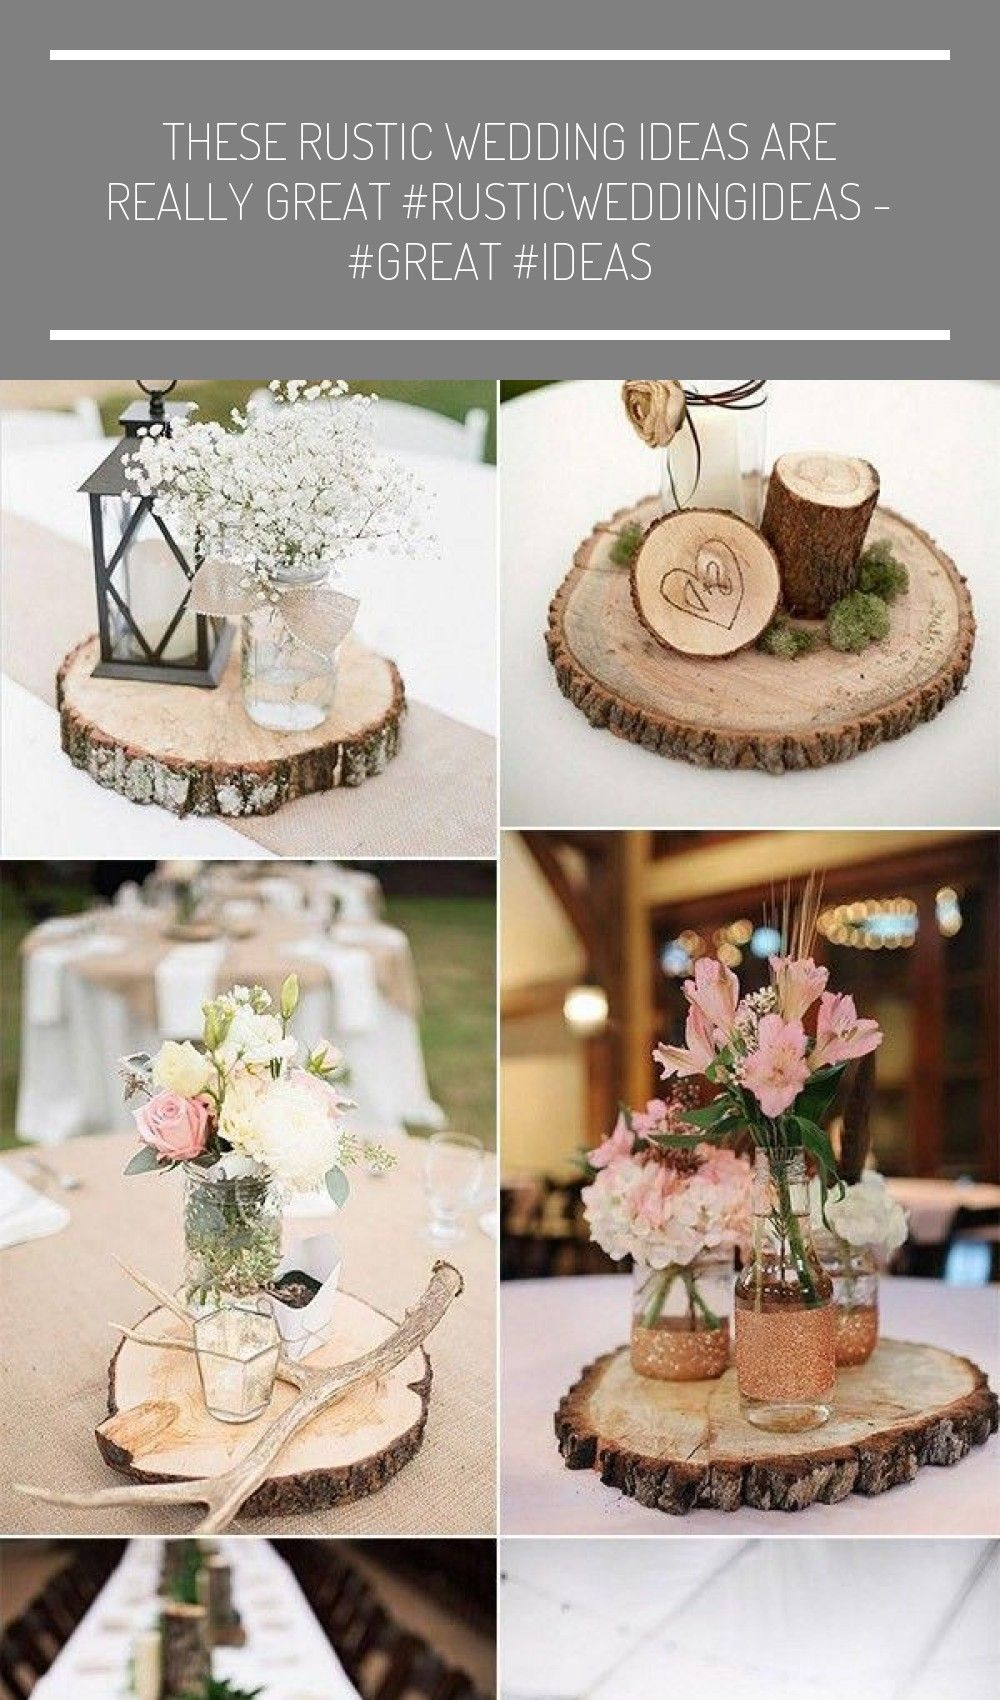 These rustic wedding ideas are really great #rusticweddingideas #great #Ideas #holzscheiben deko hochzeit These rustic wedding ideas are really great #rusticweddingideas - #great #Ideas ... - Eventplanung #holzscheibendeko